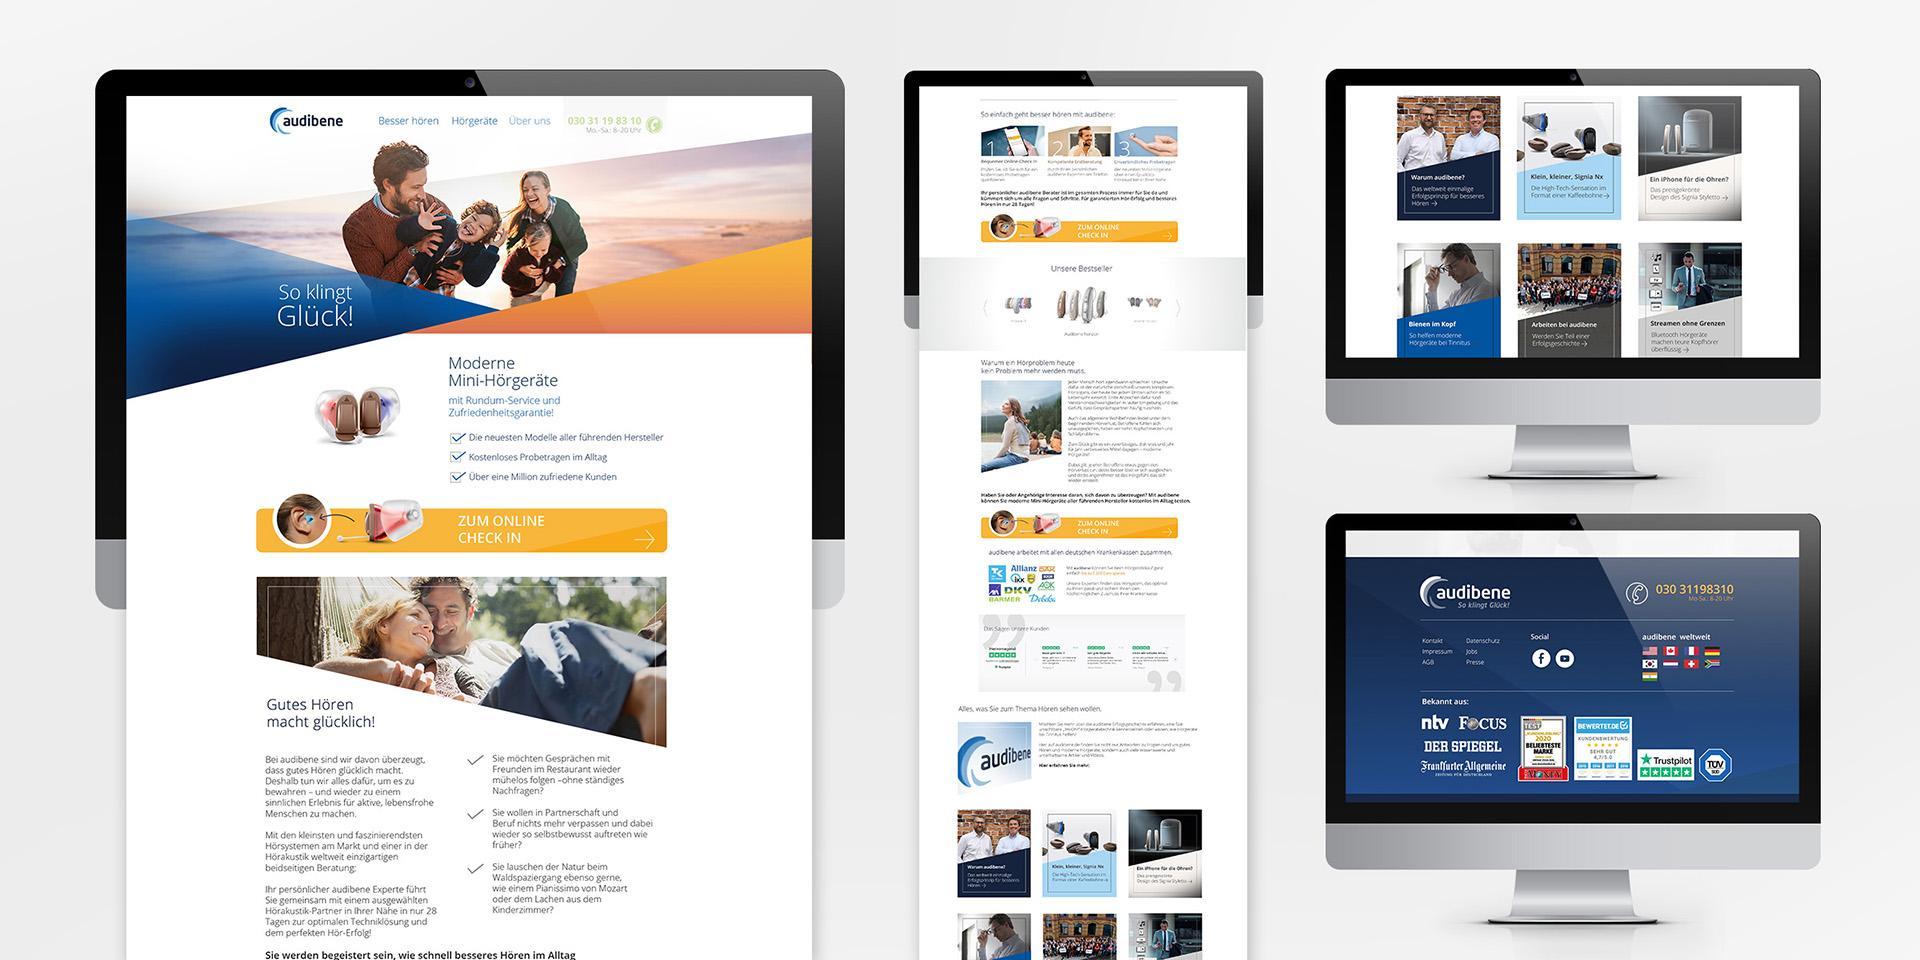 gfd ab website 1 werbeagentur werbung grafik print Kreativ agentur muenchen full service 360 marketing